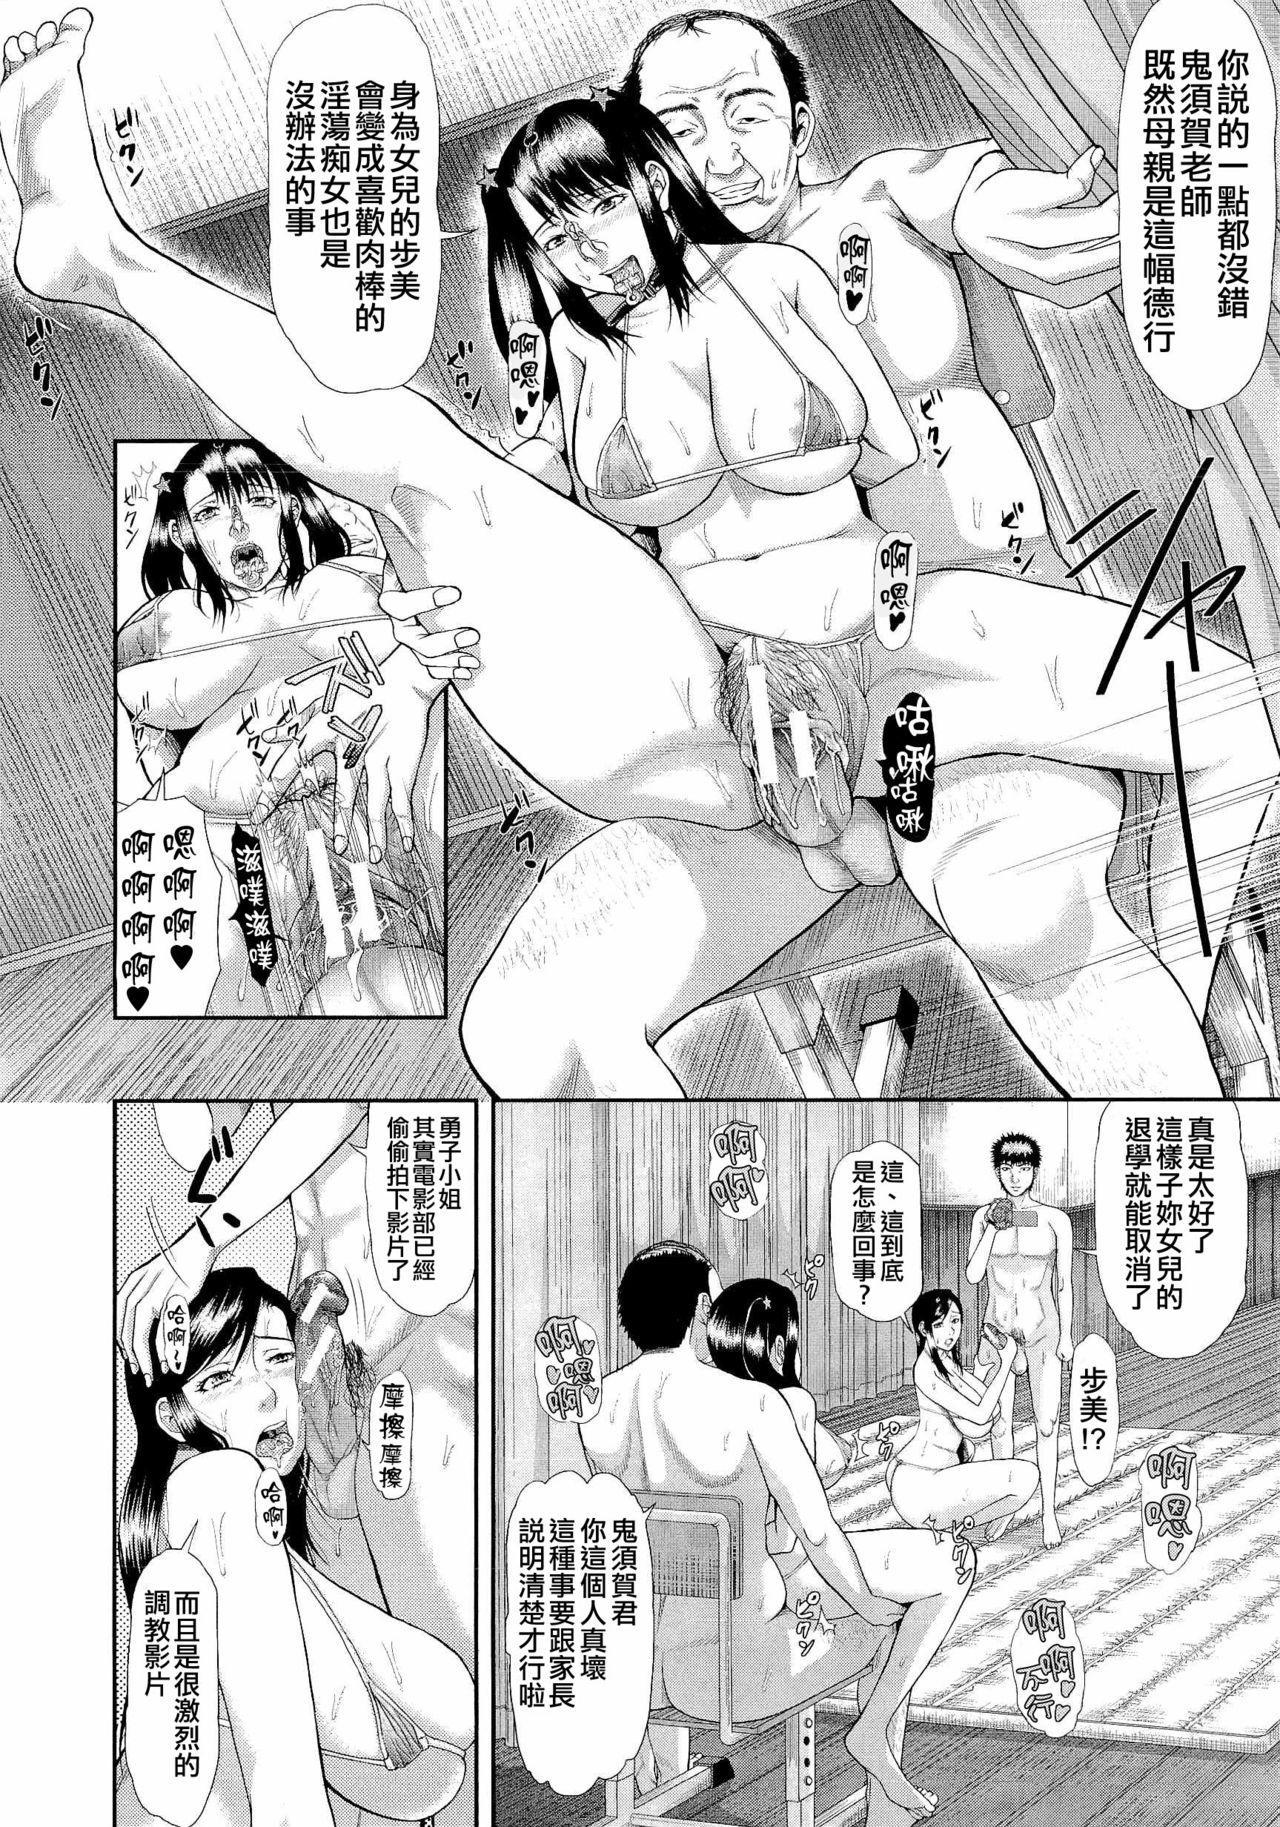 [Honebuto Danshaku] Innou Kaizou Program ~Oyako Zecchou Cult Ochi~ [Chinese]【不想记名重嵌--高质量图源】 146